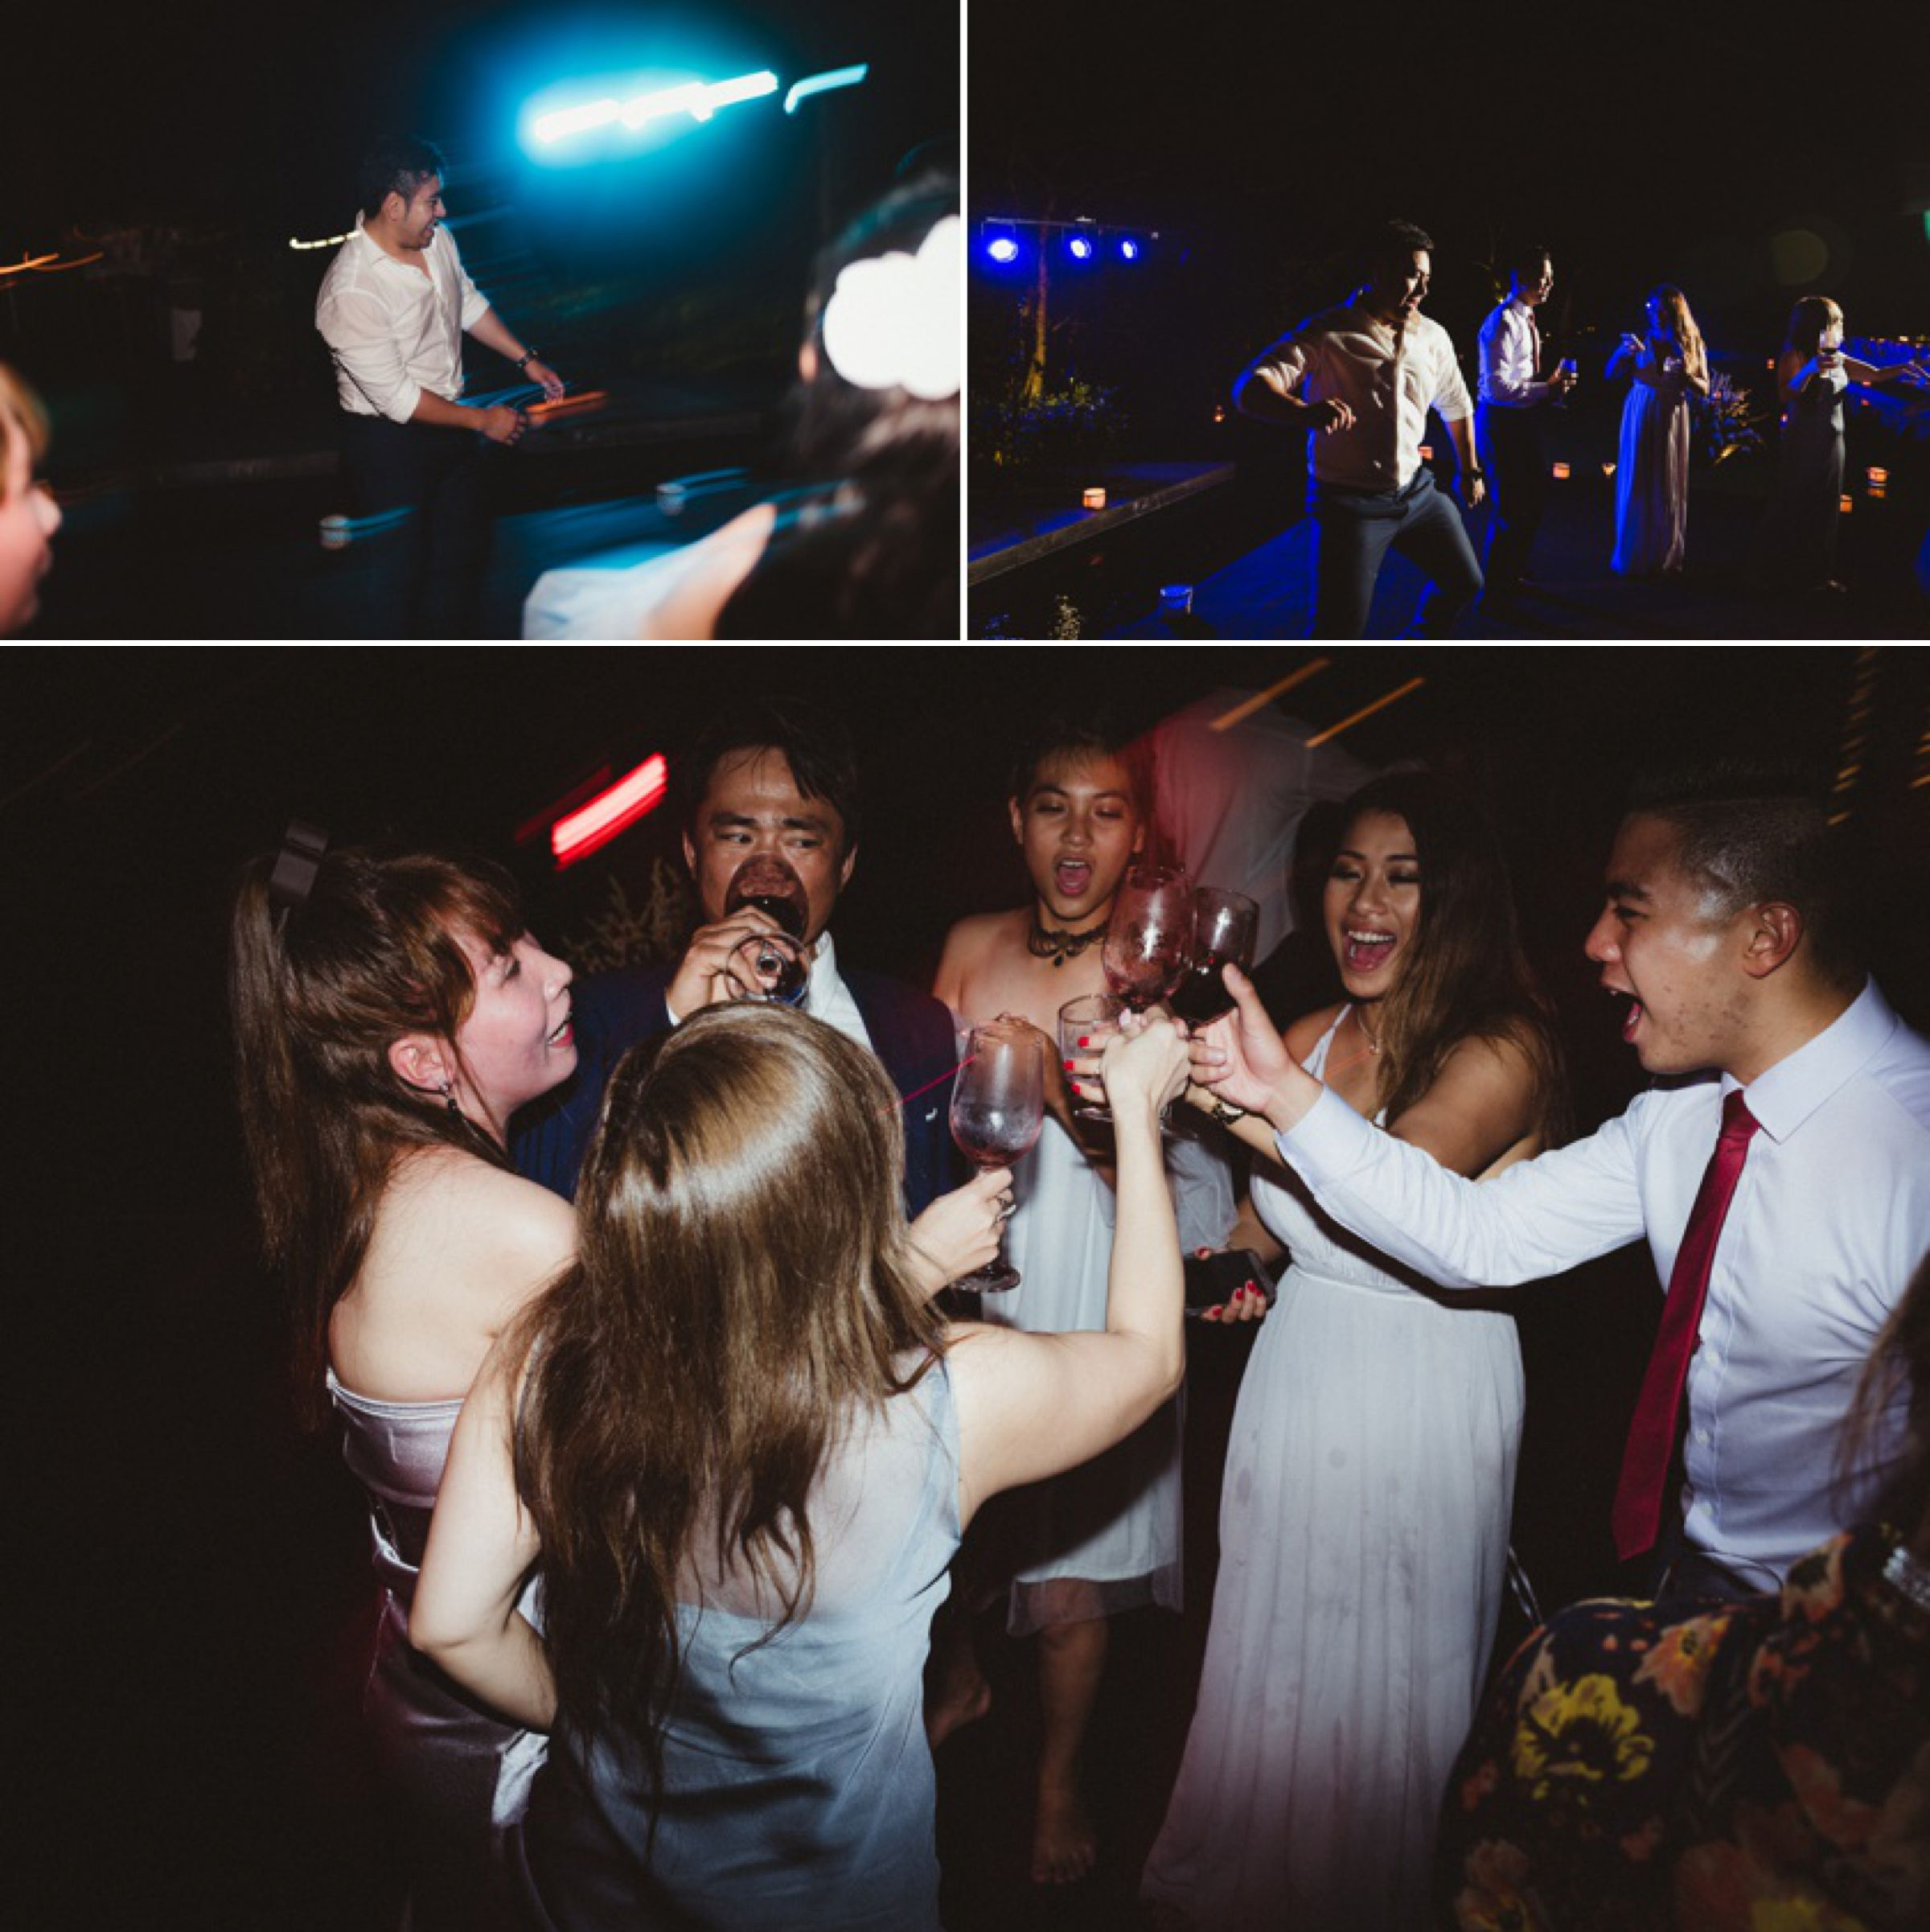 Tim-Danika-Bali-Wedding-Pyara-Photo-Evans 49.jpg